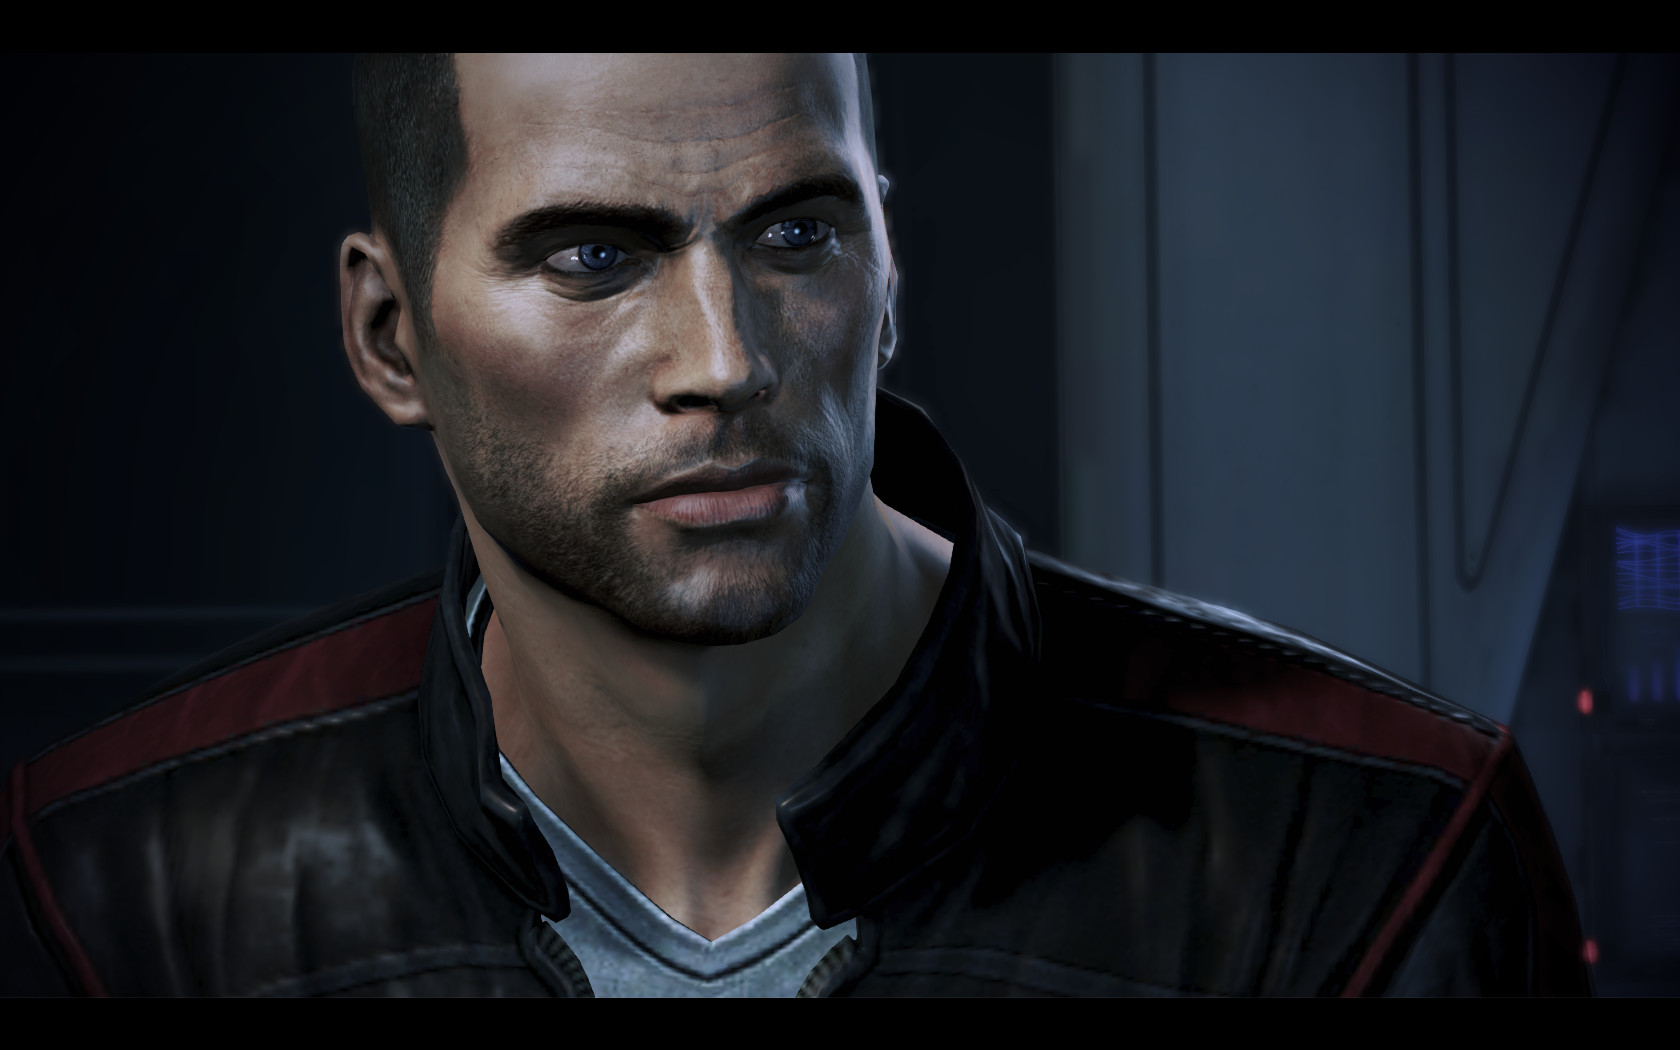 Commander Shepard Mass Effect 3 照片 38072963 潮流粉丝